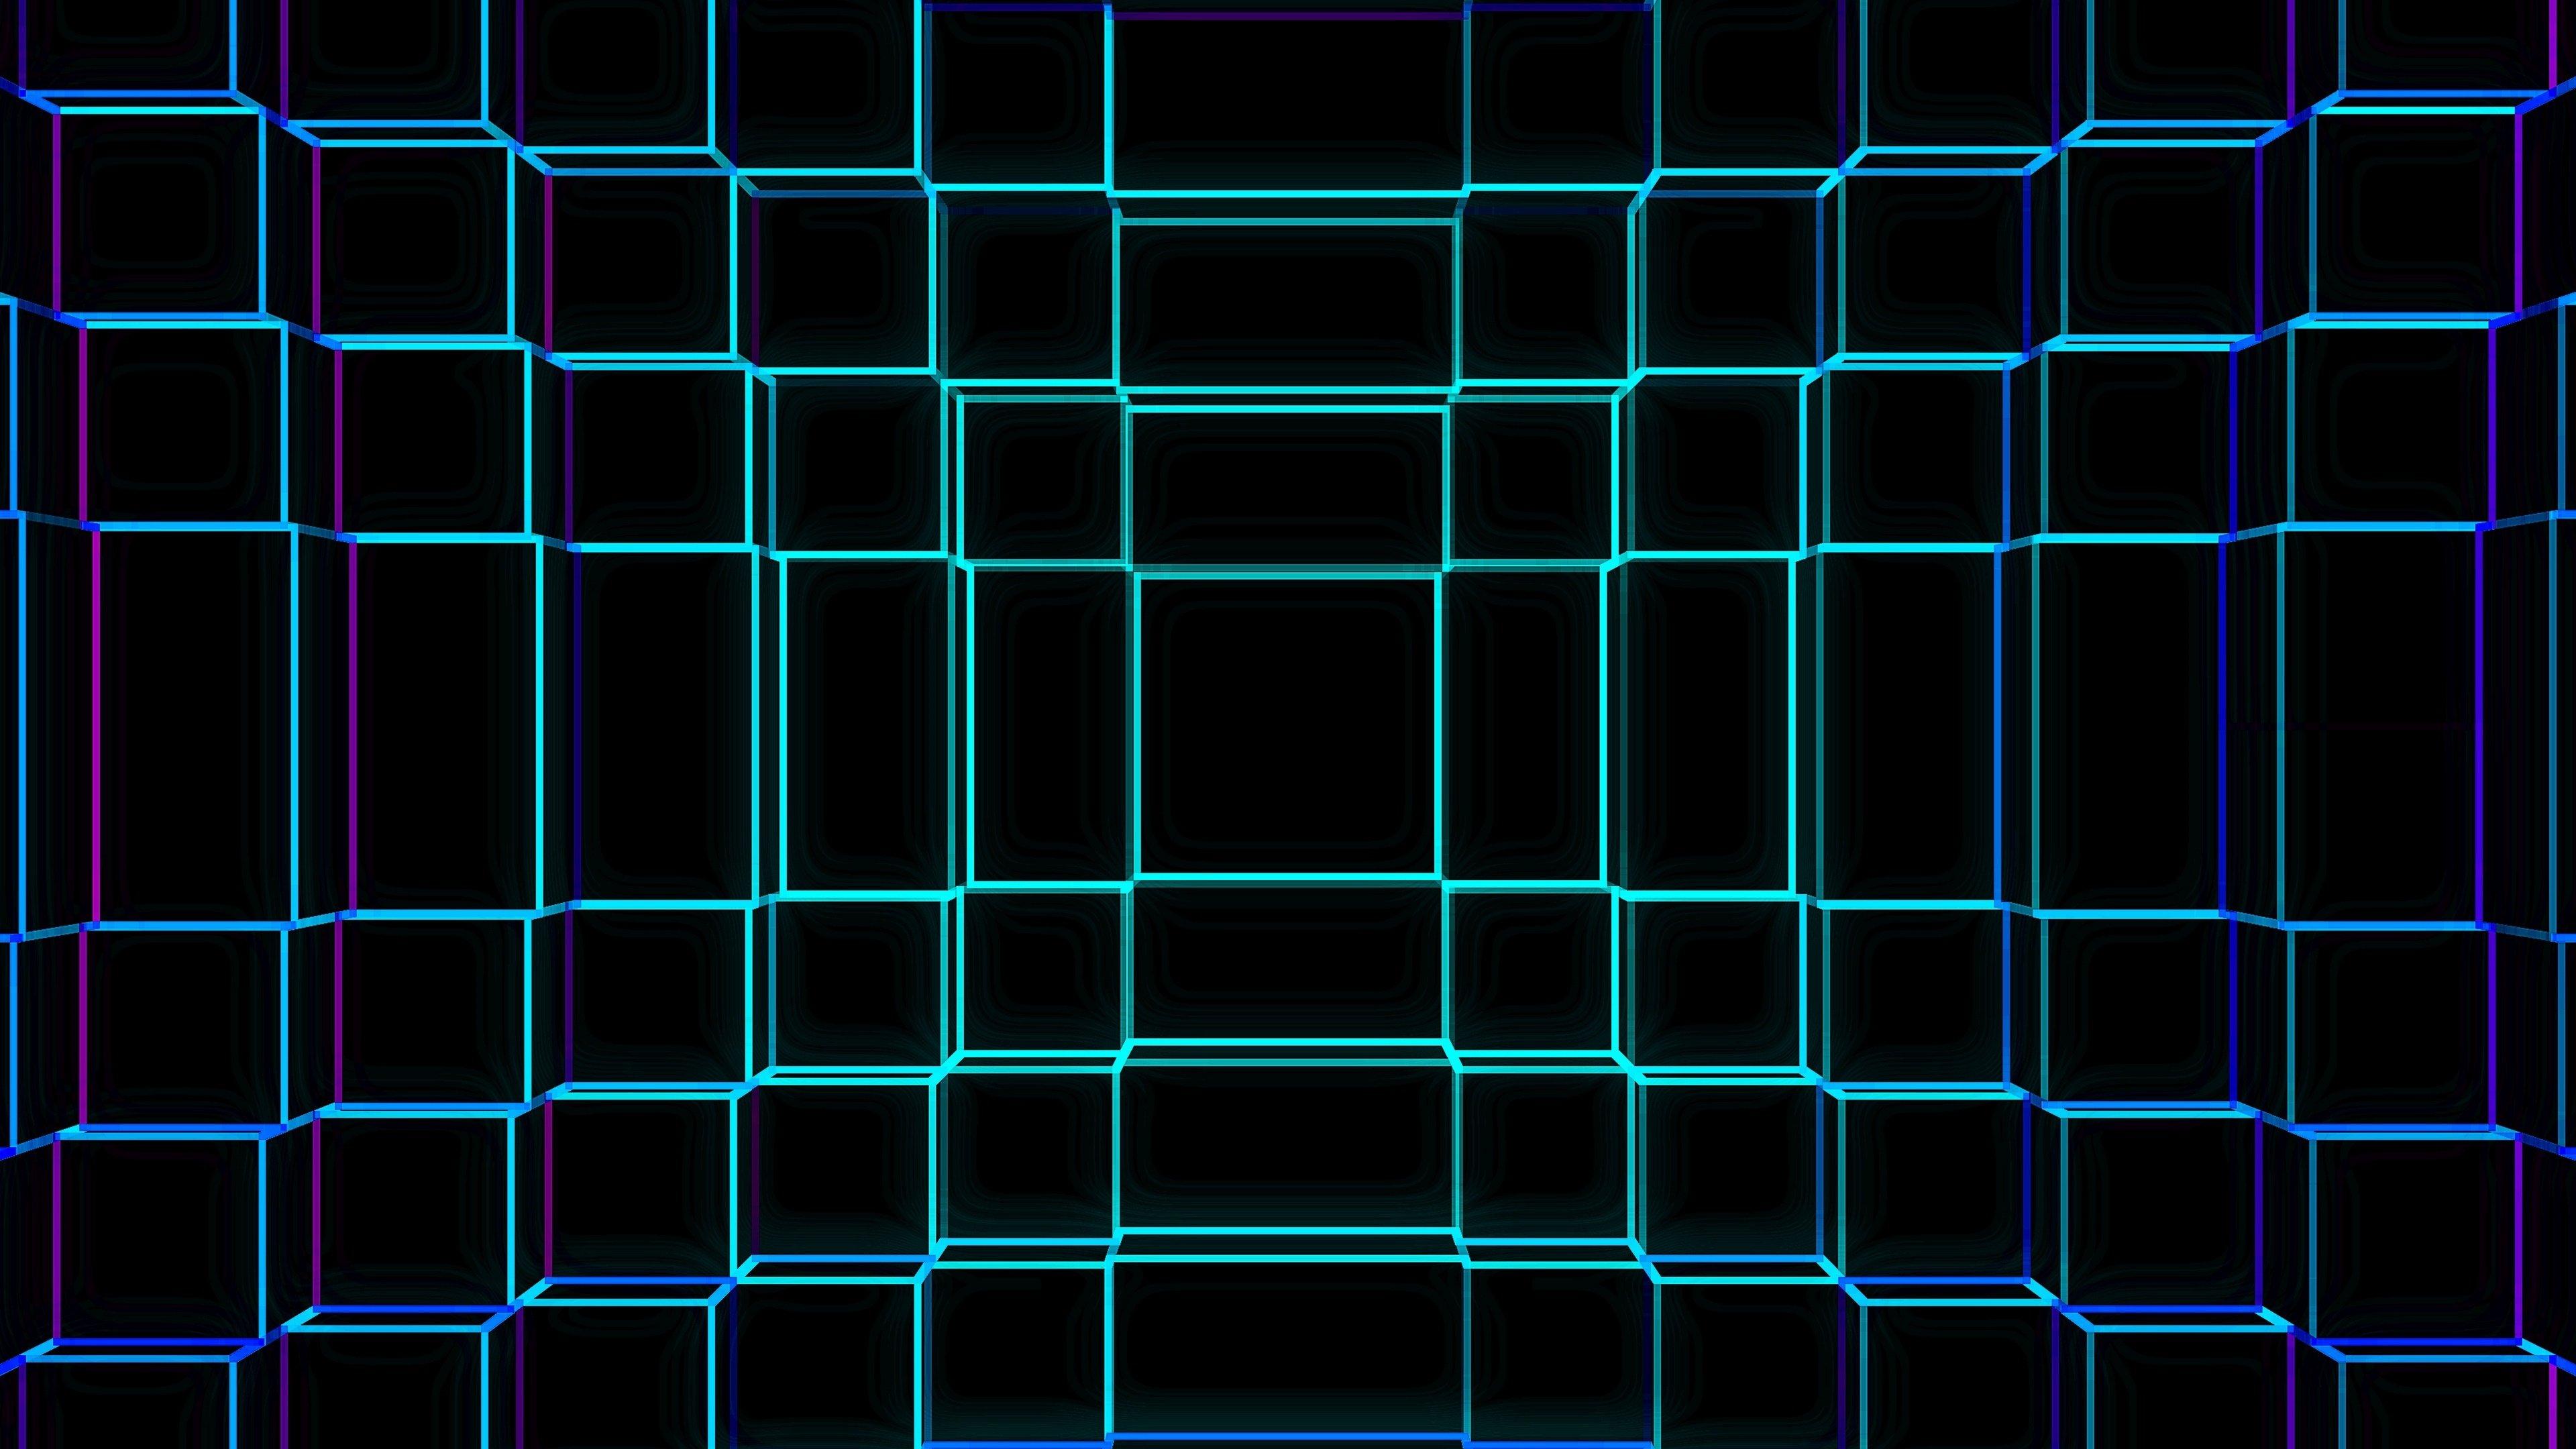 Wallpaper 3D Blue geometric grid